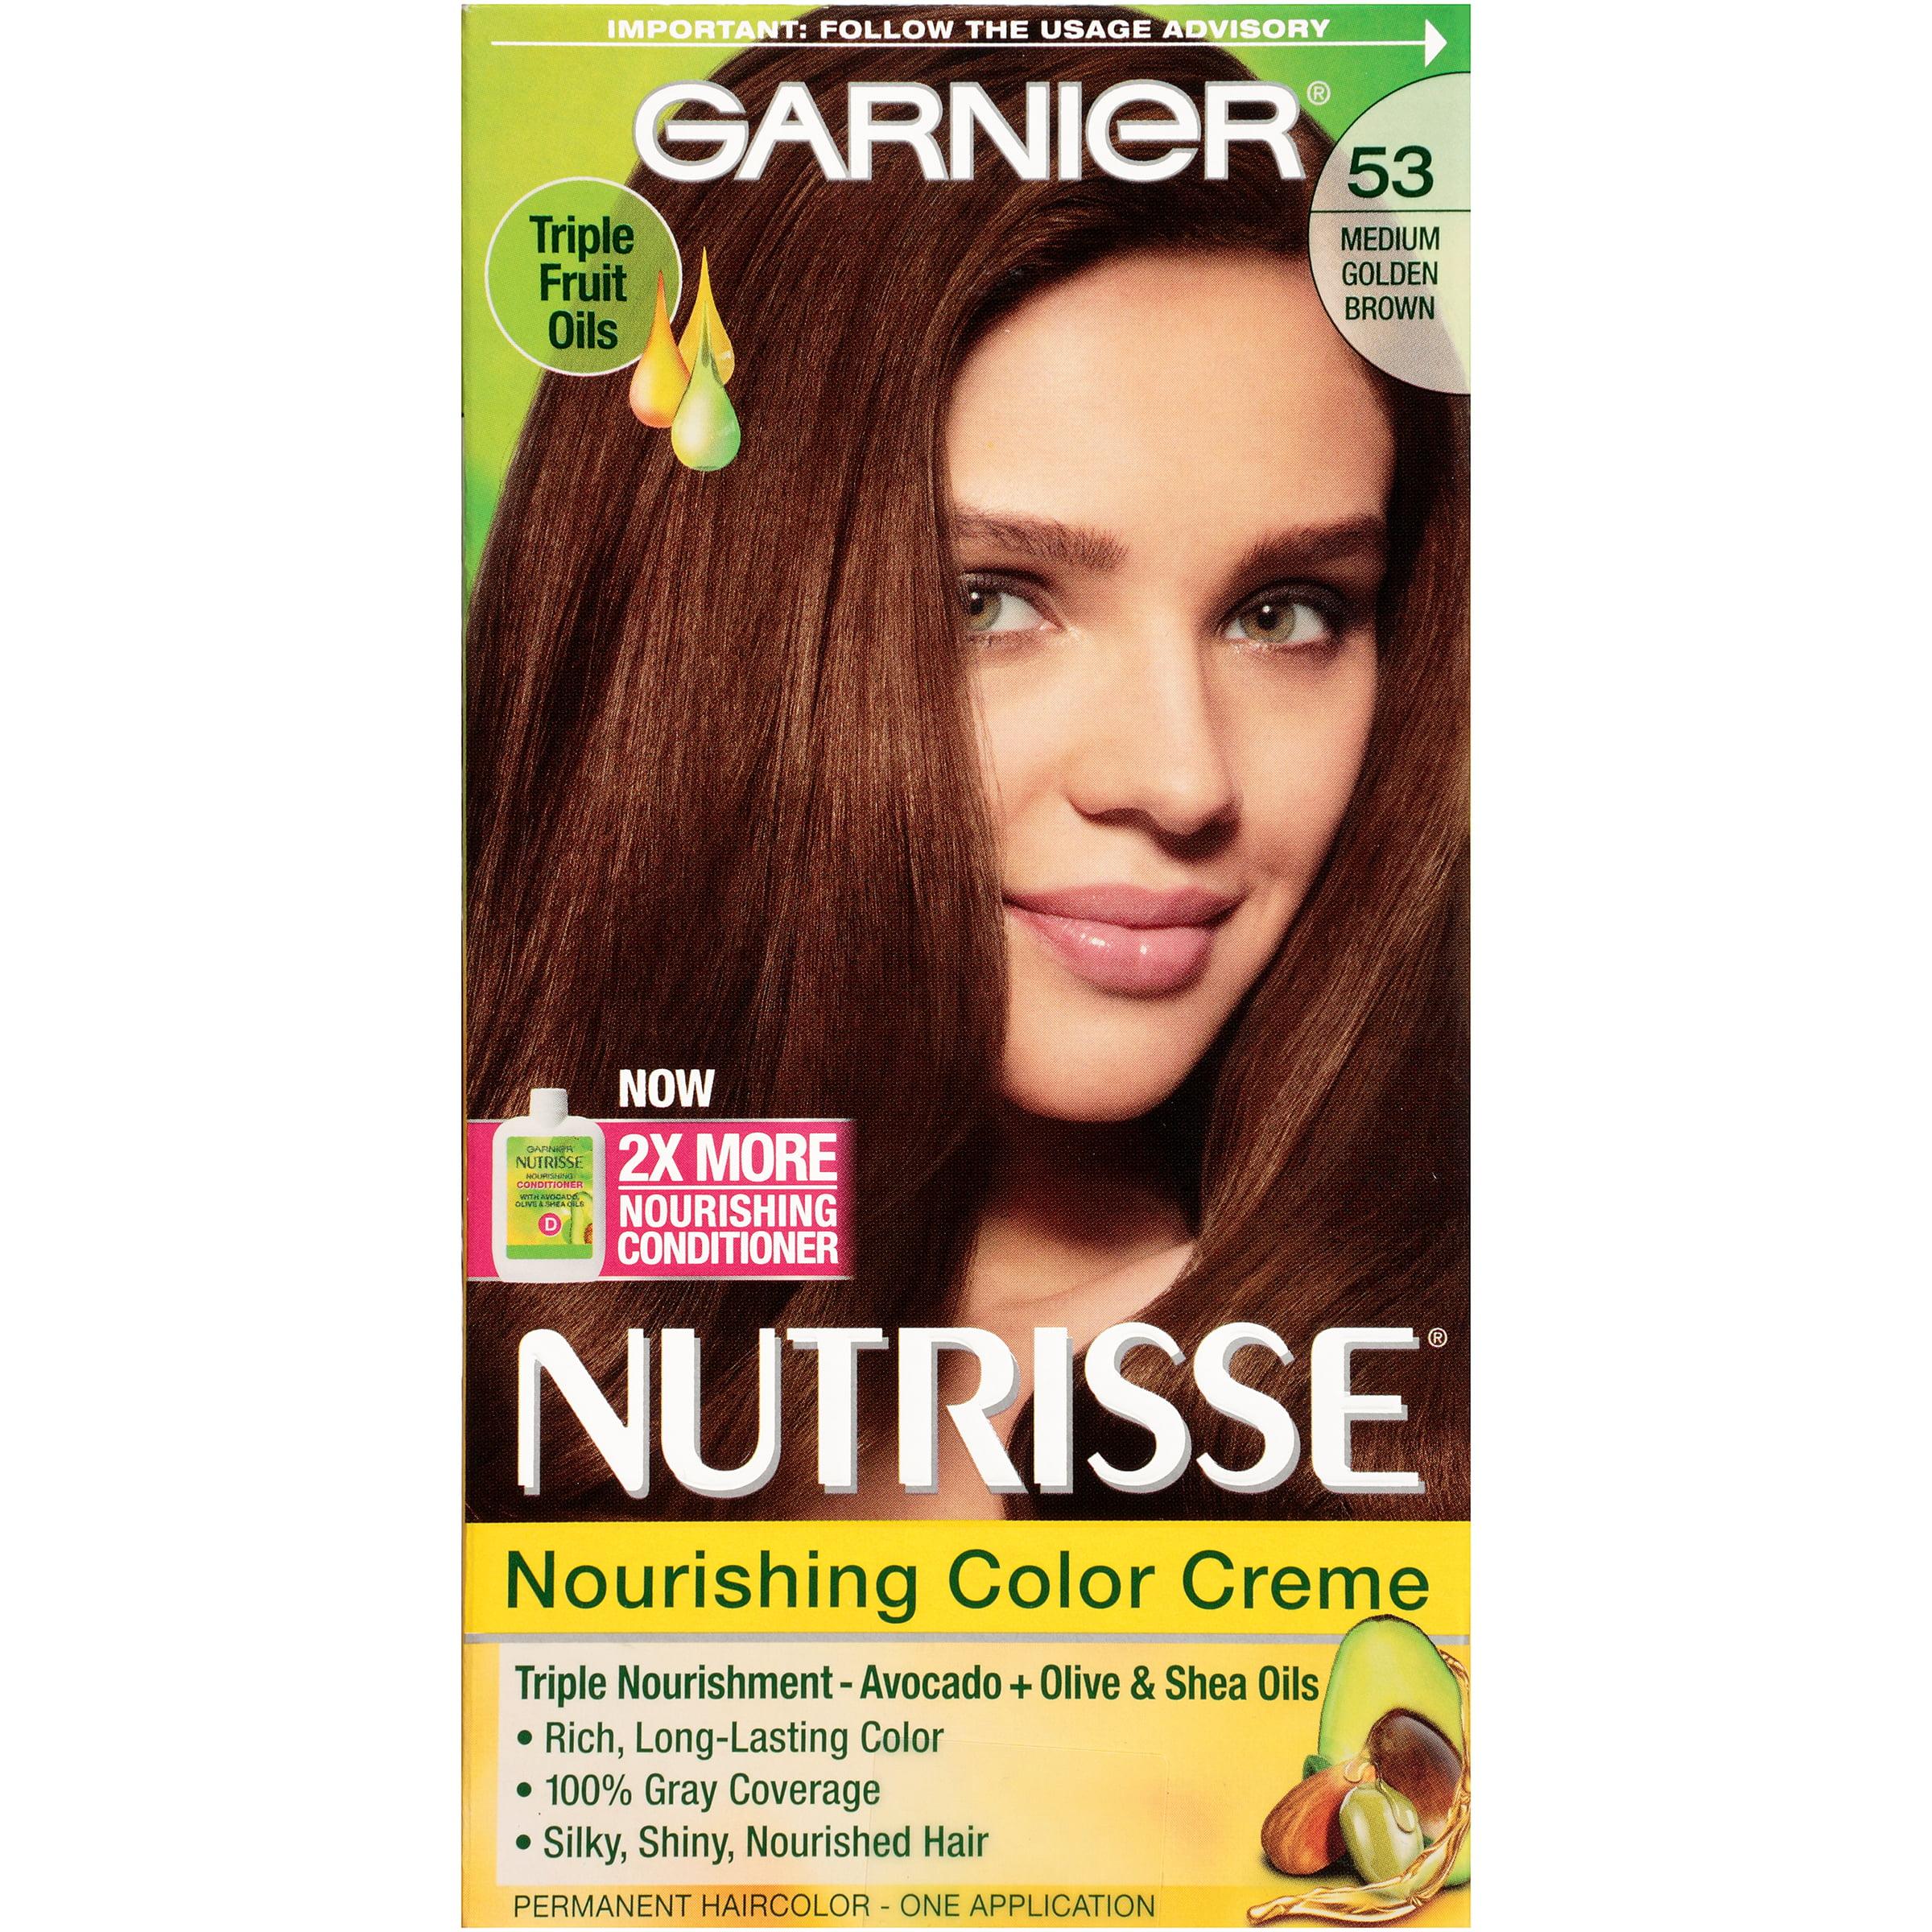 Garnier 174 Nutrisse 174 Nourishing Color Creme Walmart Com